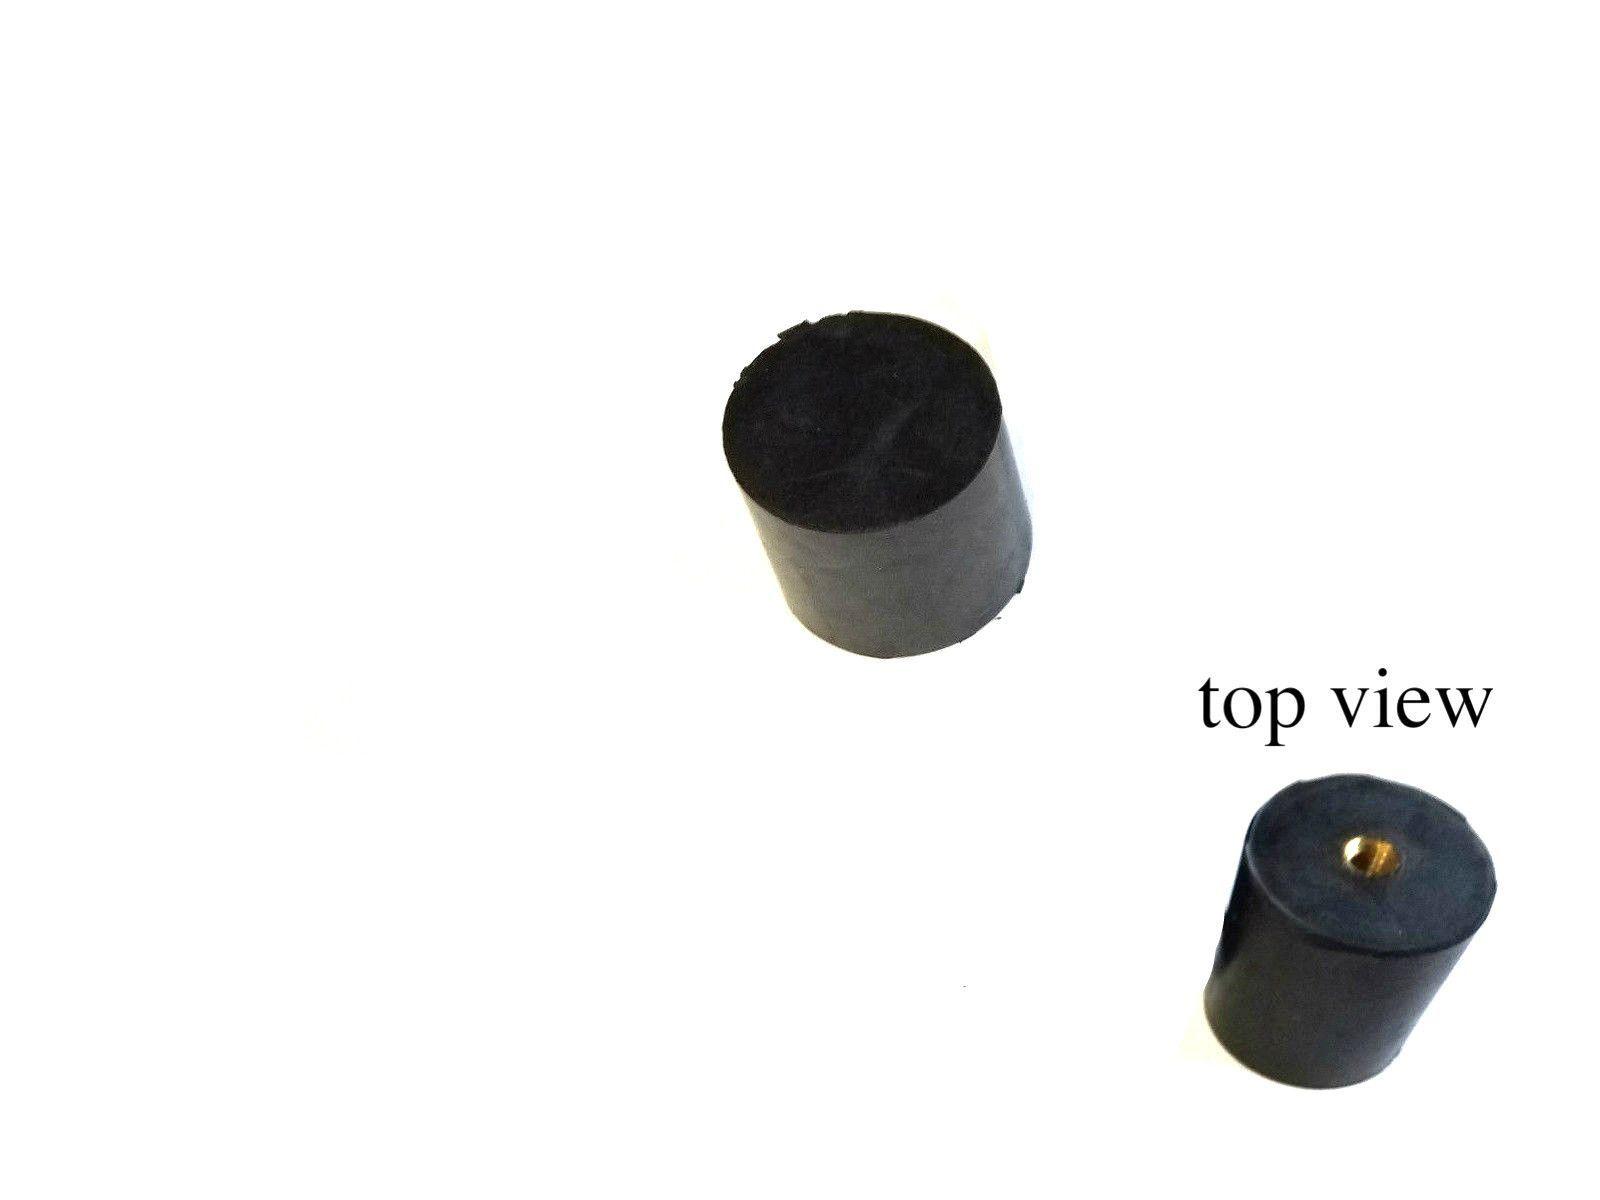 1 3 8 Dia X 1 5 16 Ht Rubber Vibration Isolator Mount Feet 1 4 20 Screw Hole